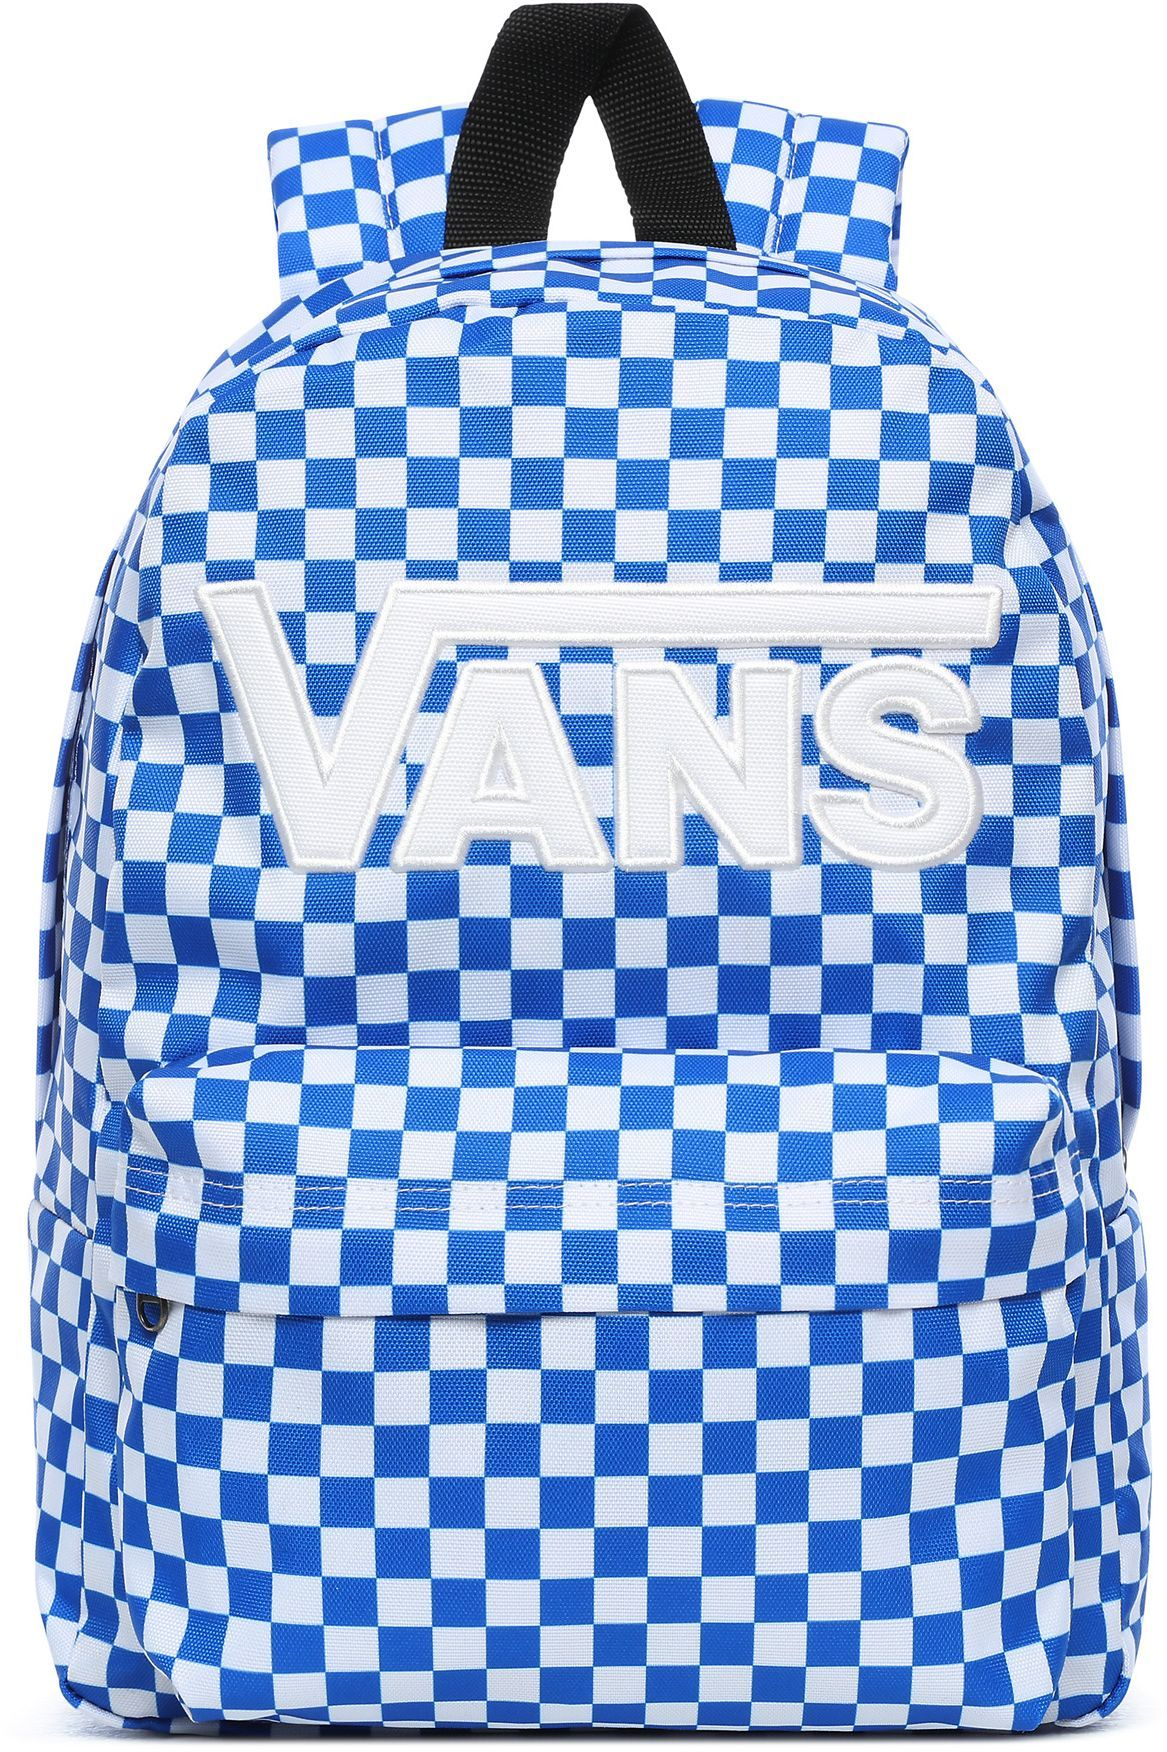 plecak dziecięcy VANS BOYS NEW SKOOL BACKPACK Victoria Blue Check